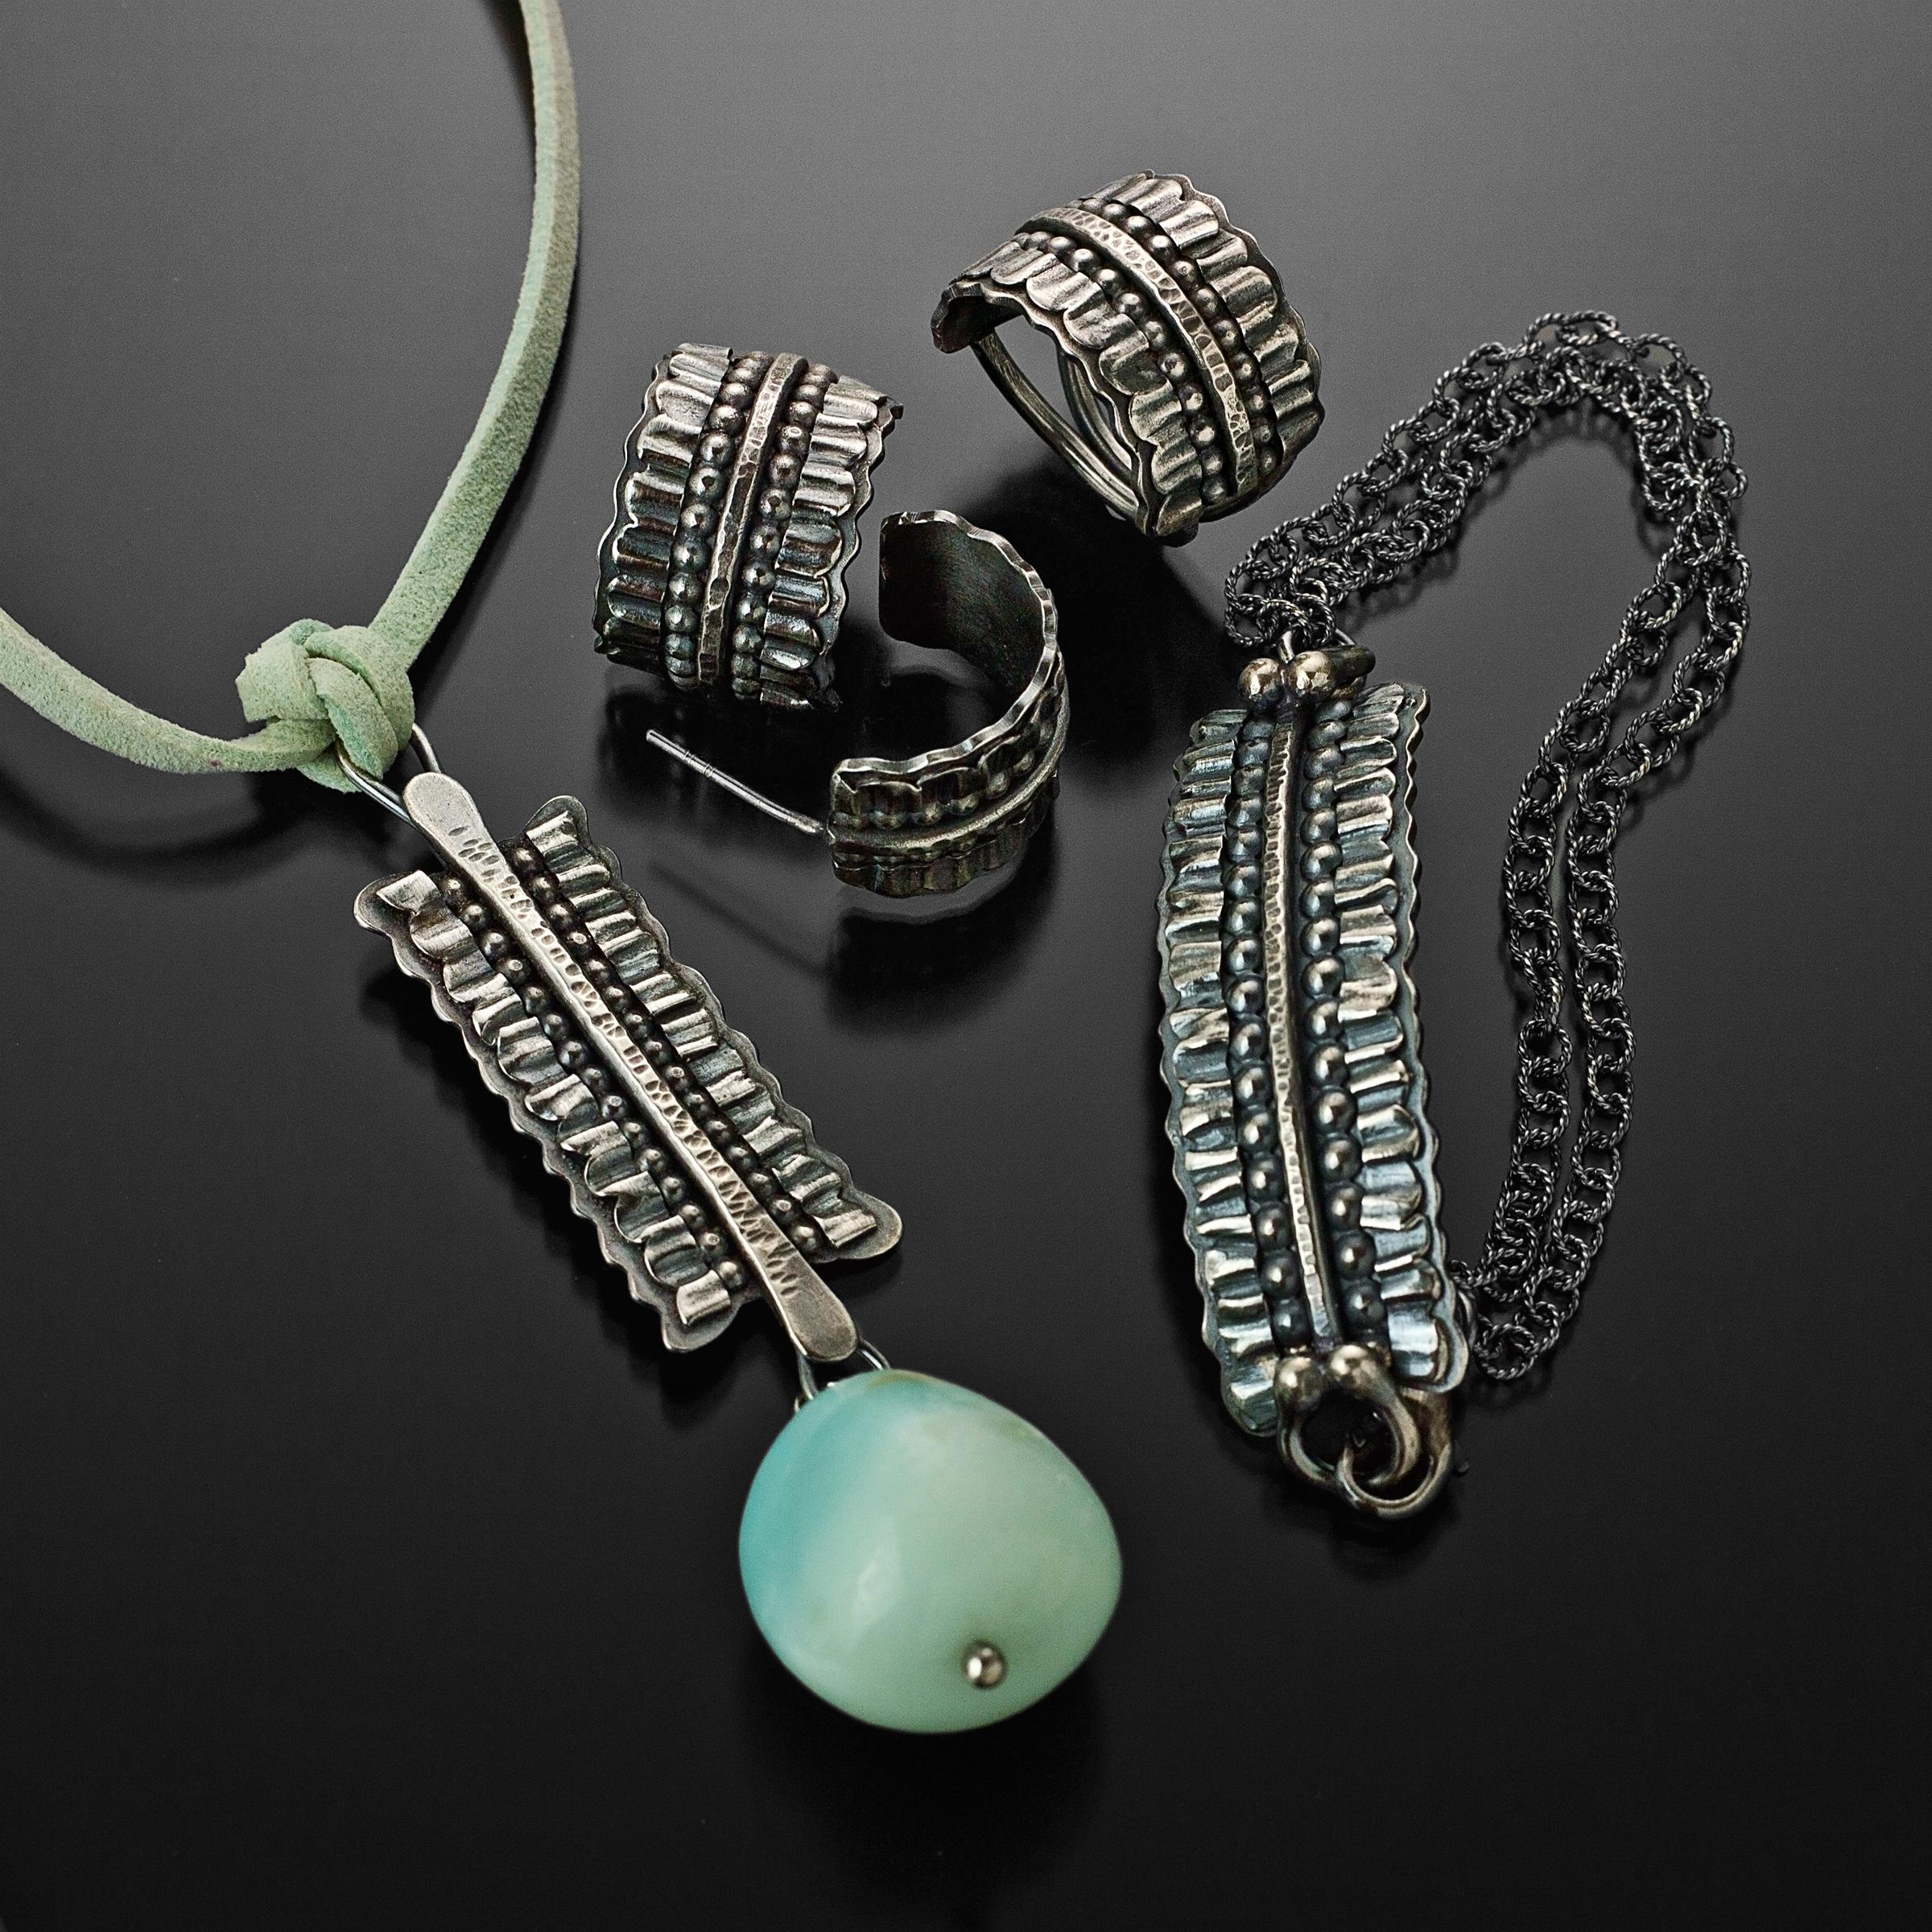 Mini Ruffles collection_Popnicute Jewelry.jpg